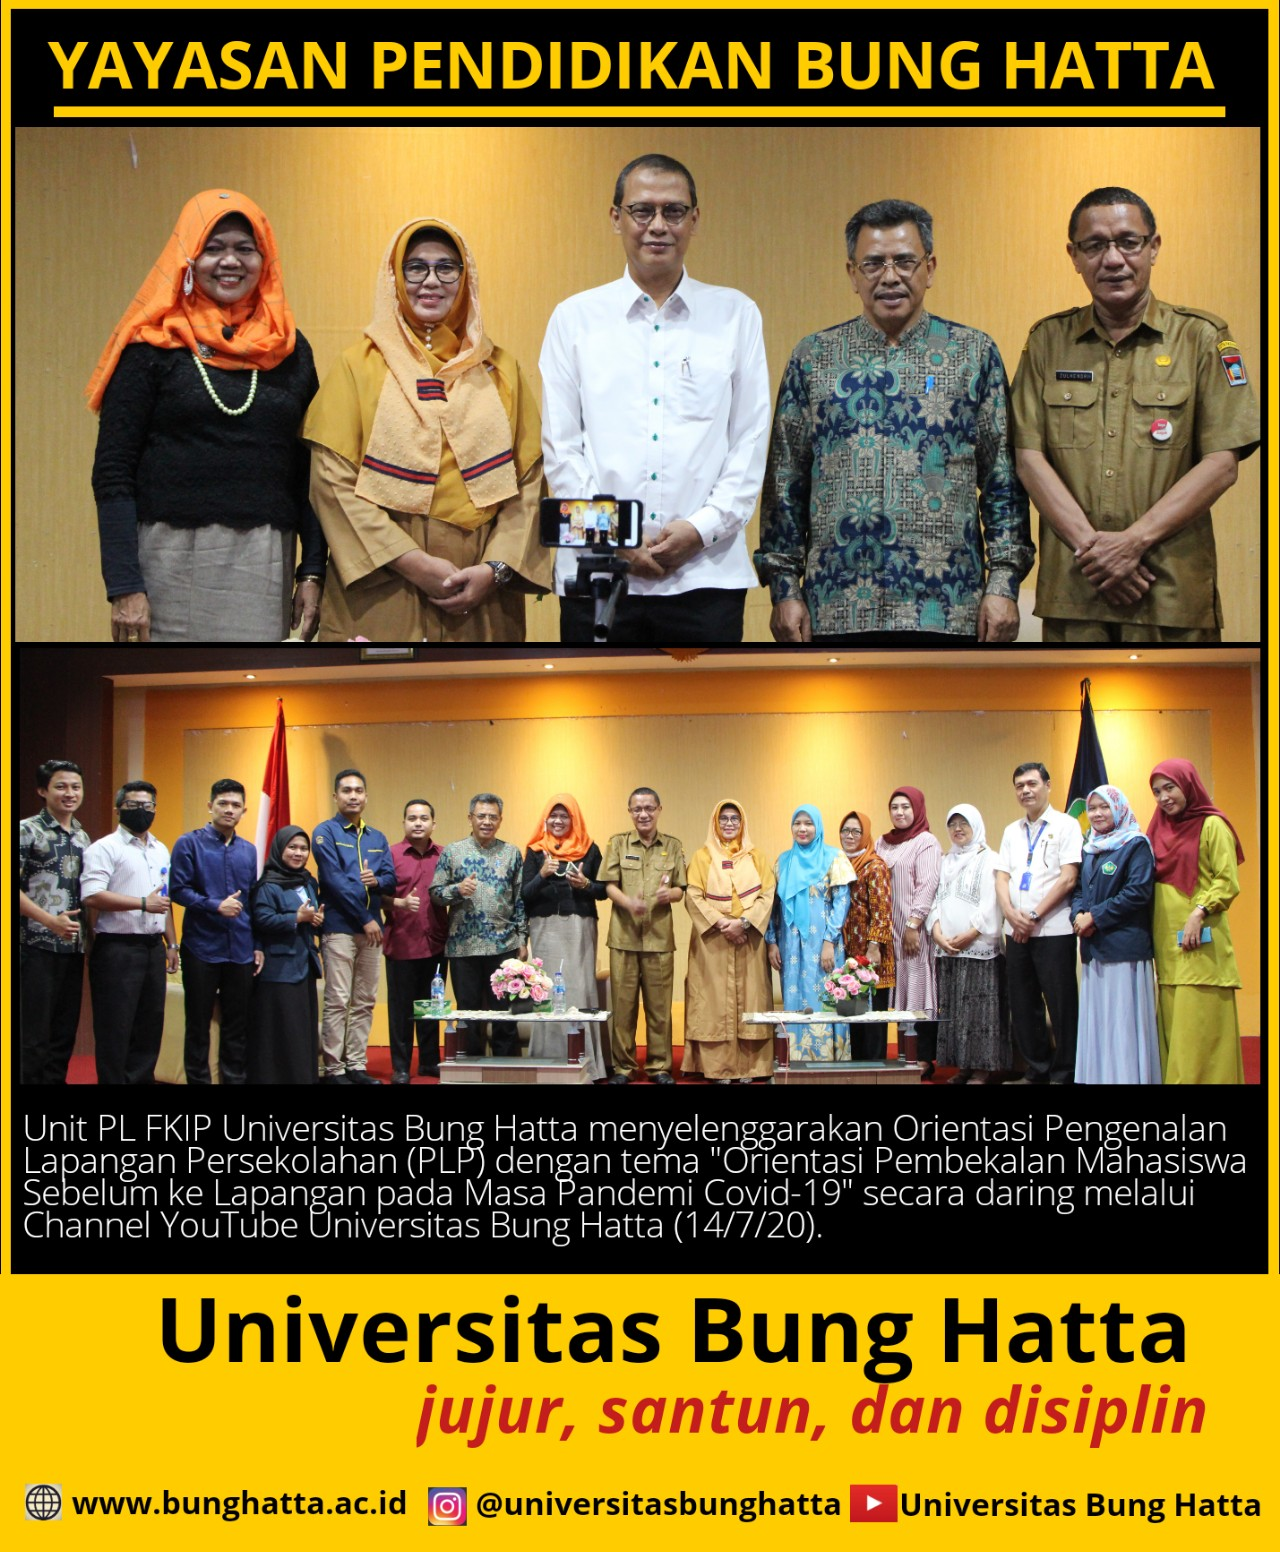 Unit PL FKIP Universitas Bung Hatta Menyelenggarakan Orientasi Pengenalan Lapangan Persekolahan (PLP)